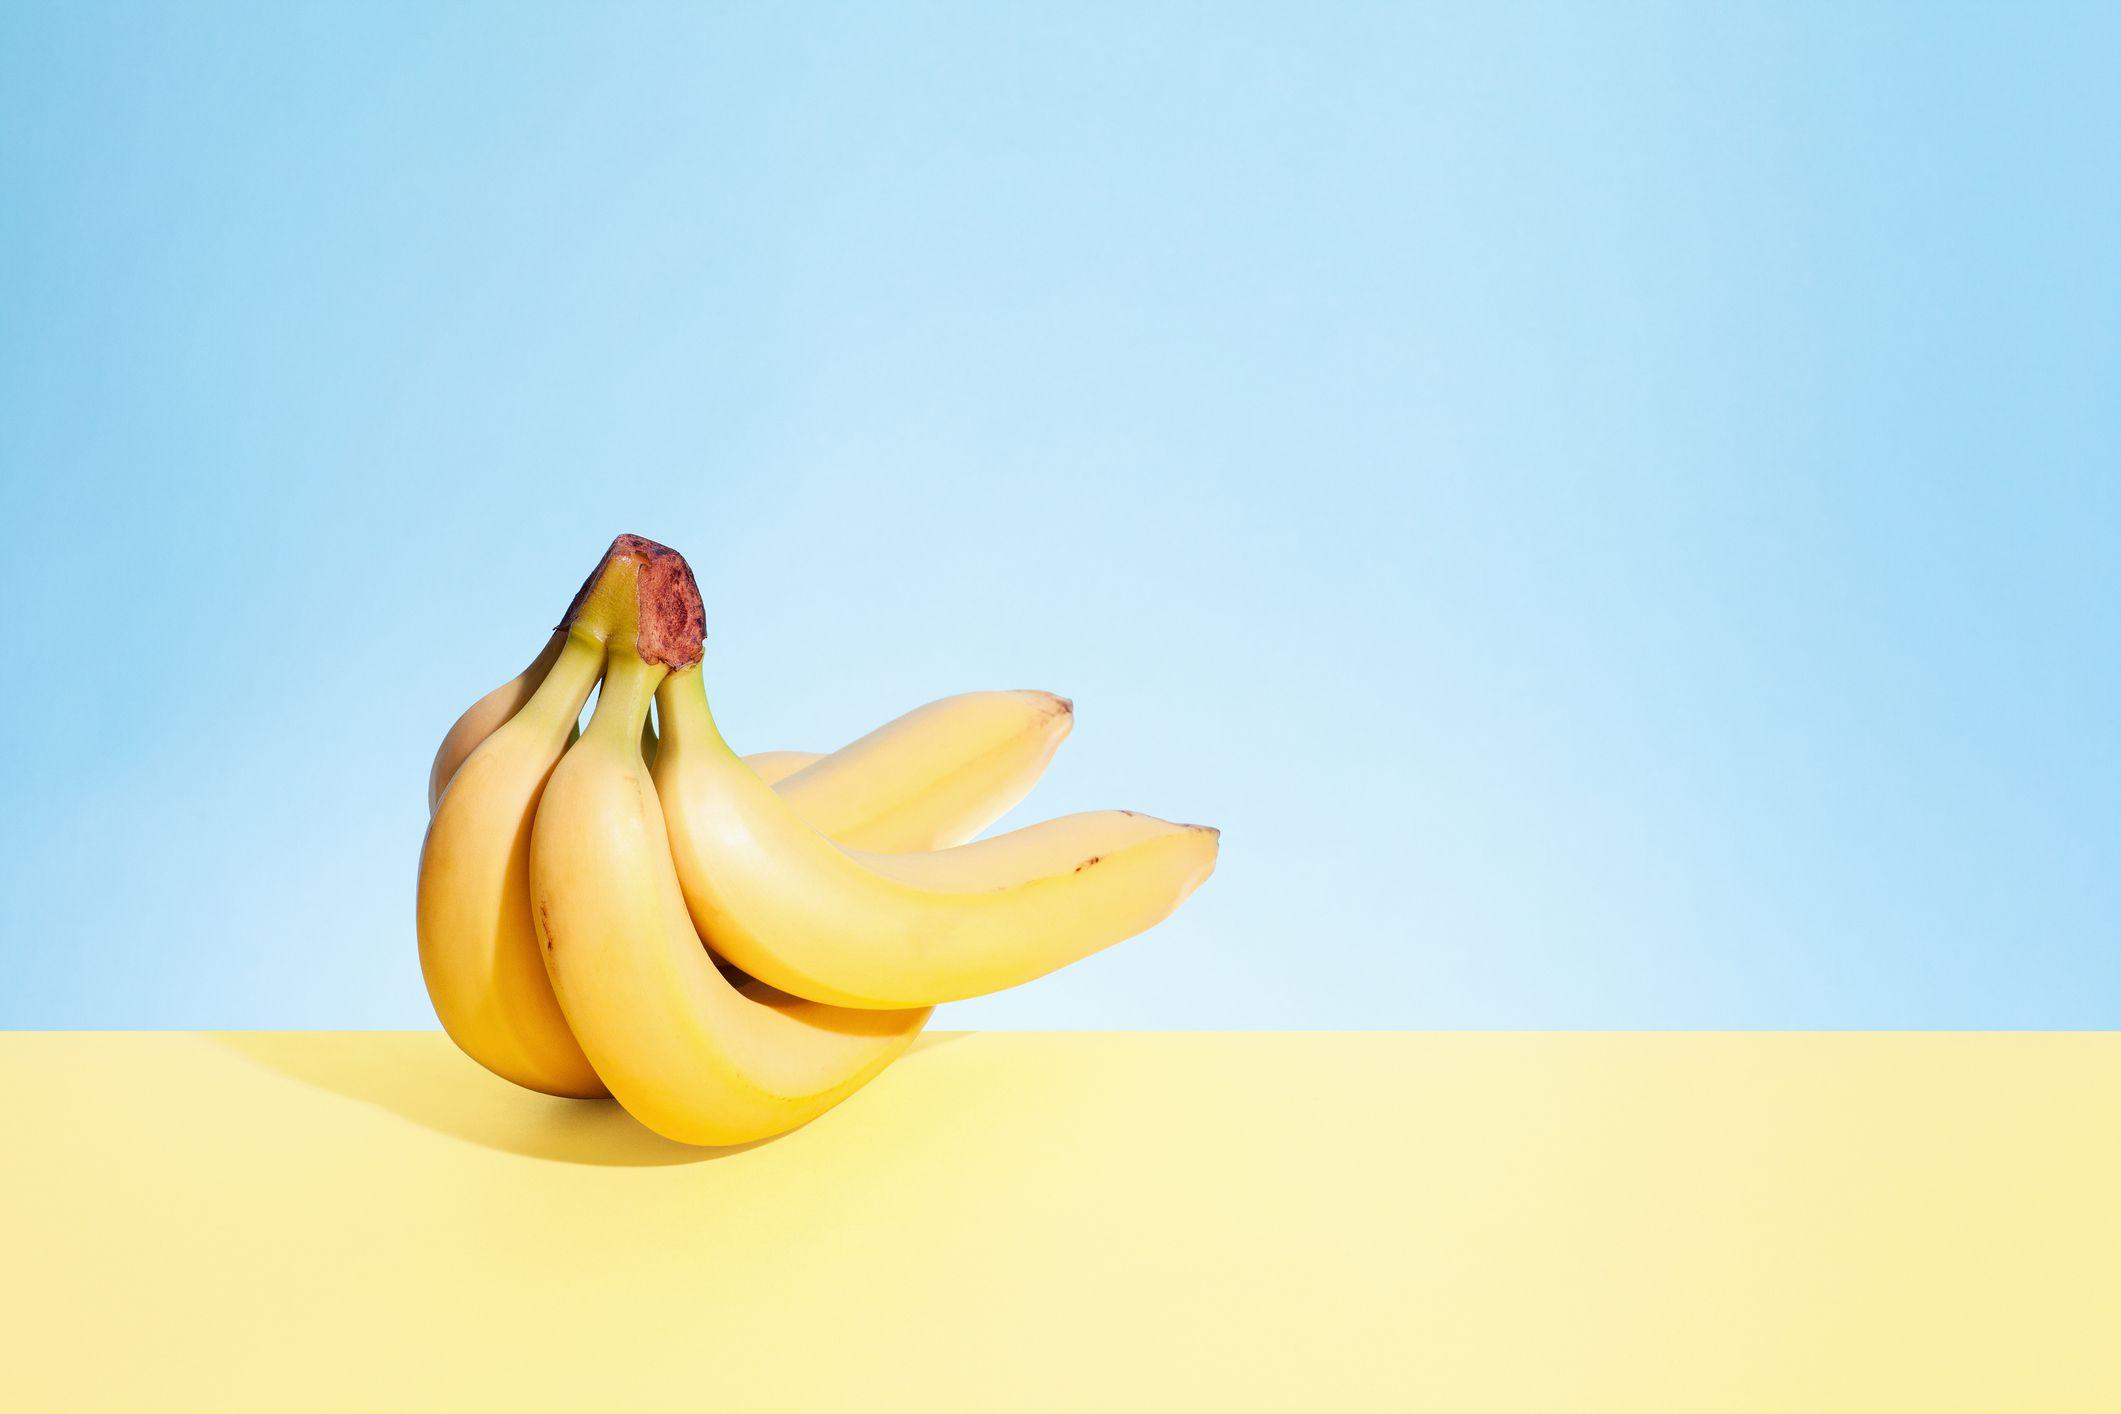 Bananas are they radioactive dating 2